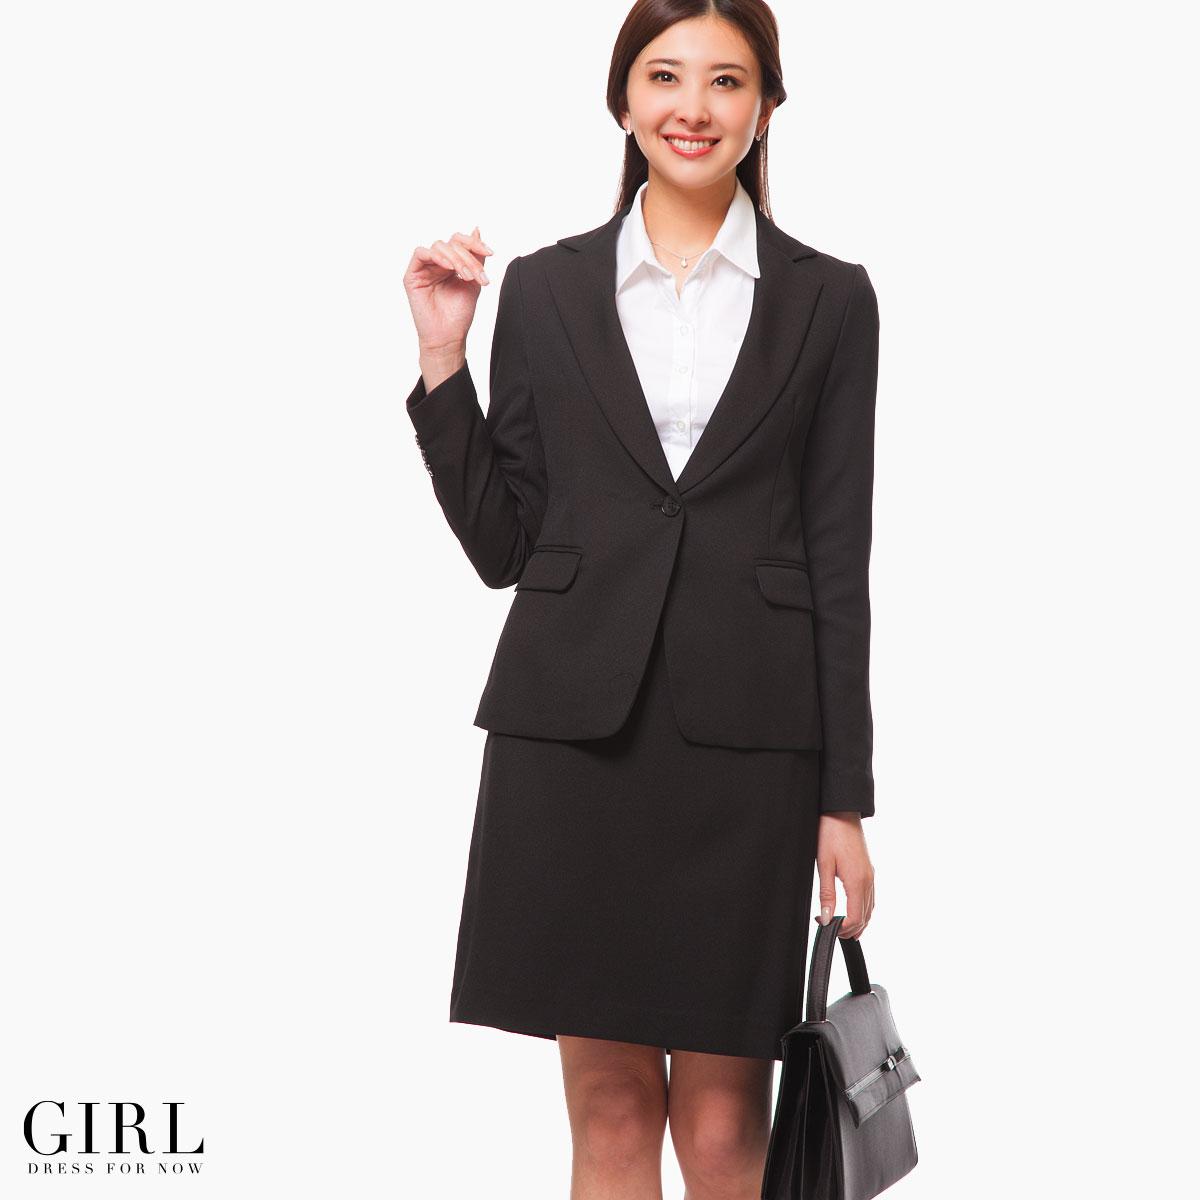 Dress shop GIRL   Rakuten Global Market: Long-sleeved suit set ...